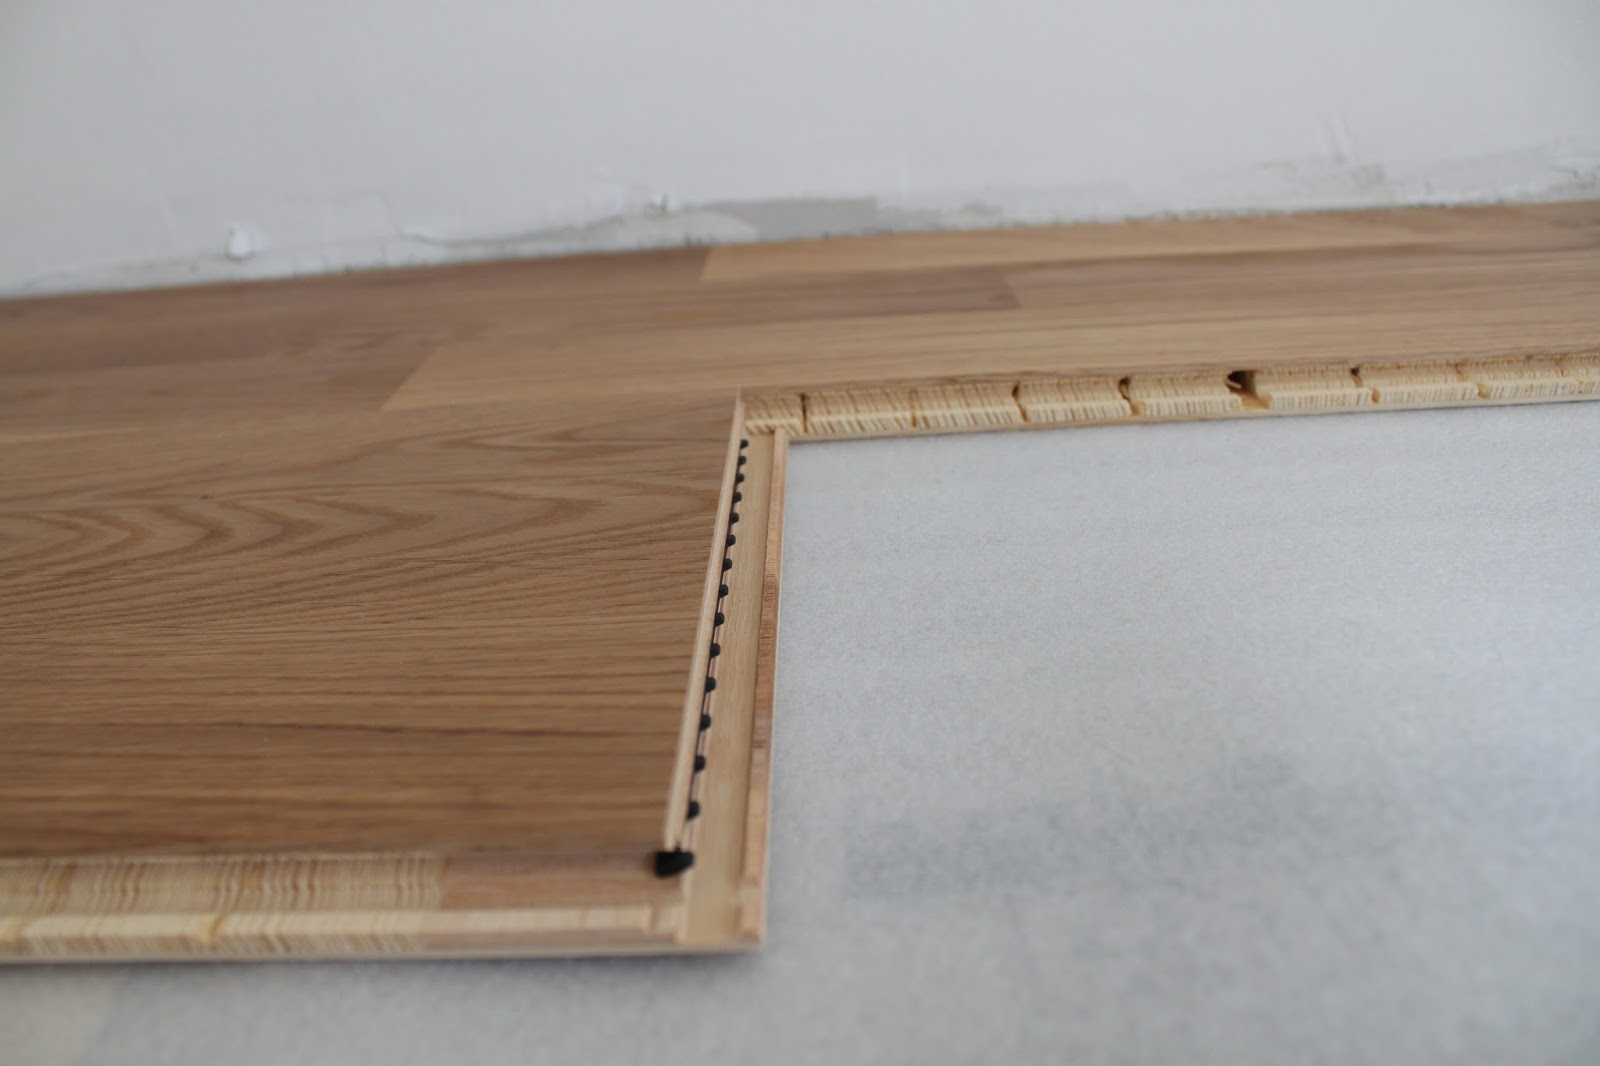 Relativ Golv Ikea Laminat. Ikea Laminat Laminate Benchtops Countertop Seam LG43